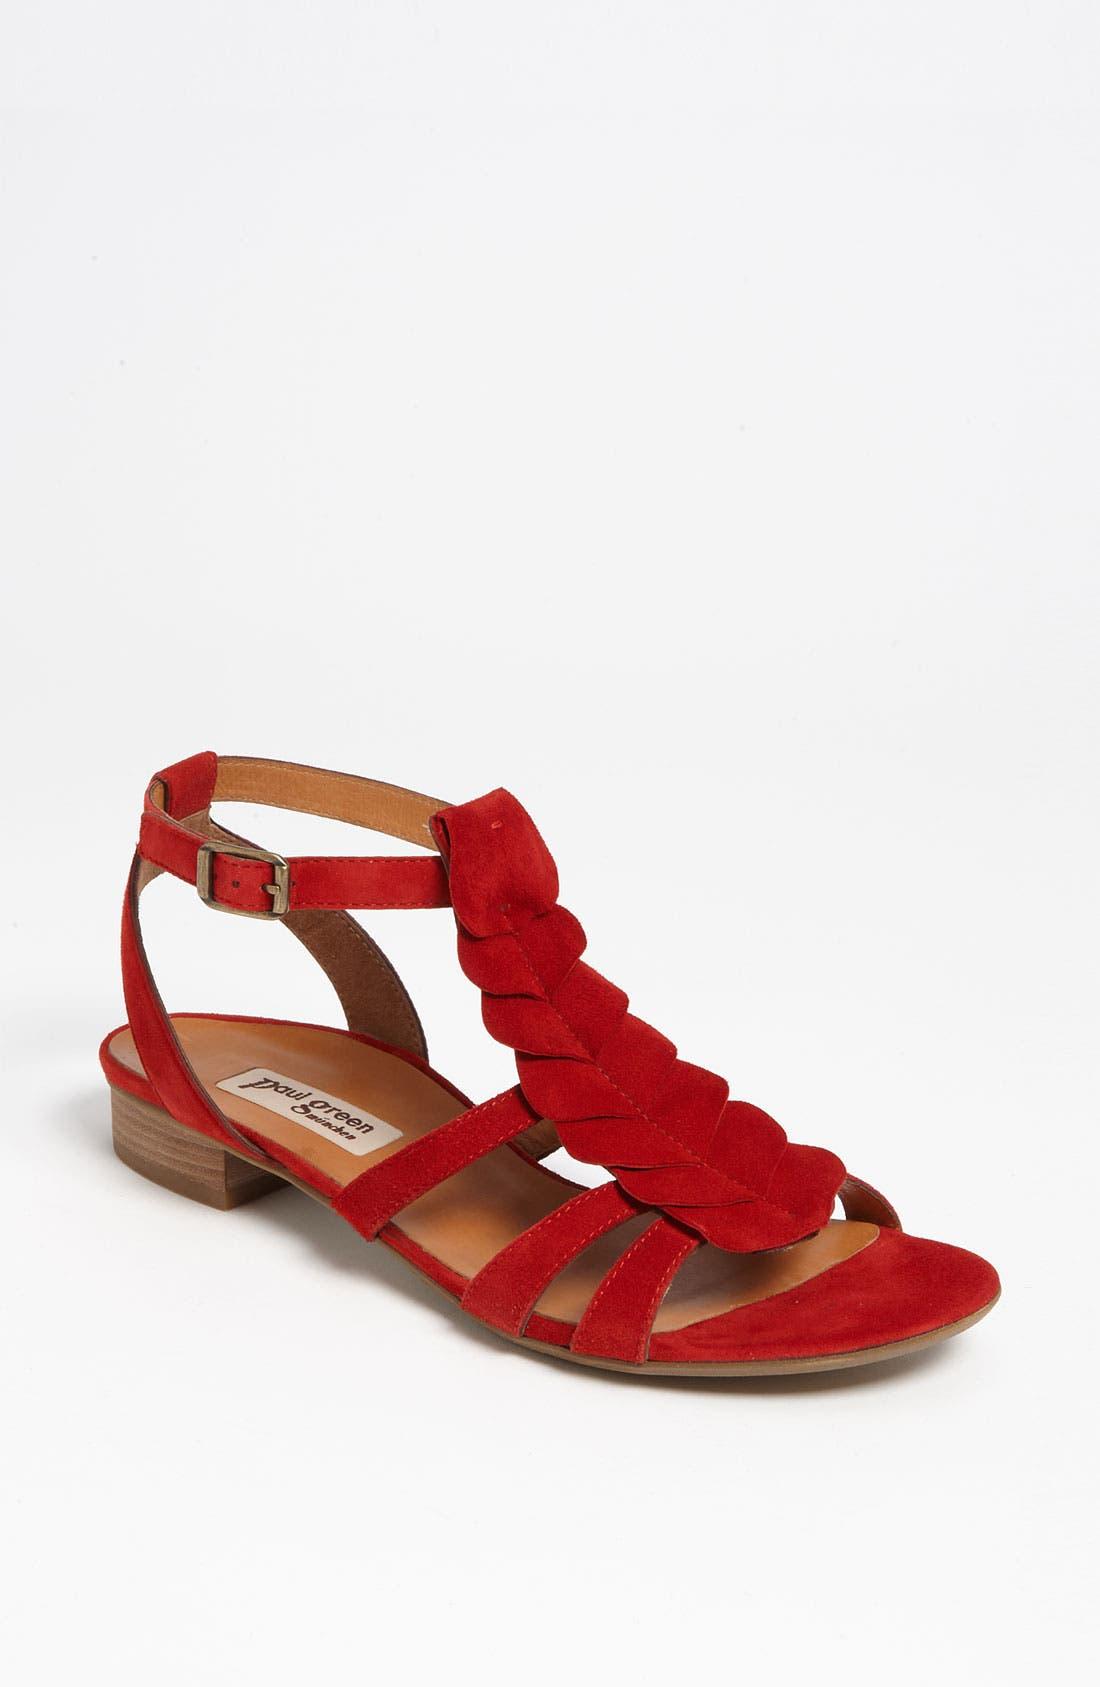 Alternate Image 1 Selected - Paul Green 'Lola' Sandal